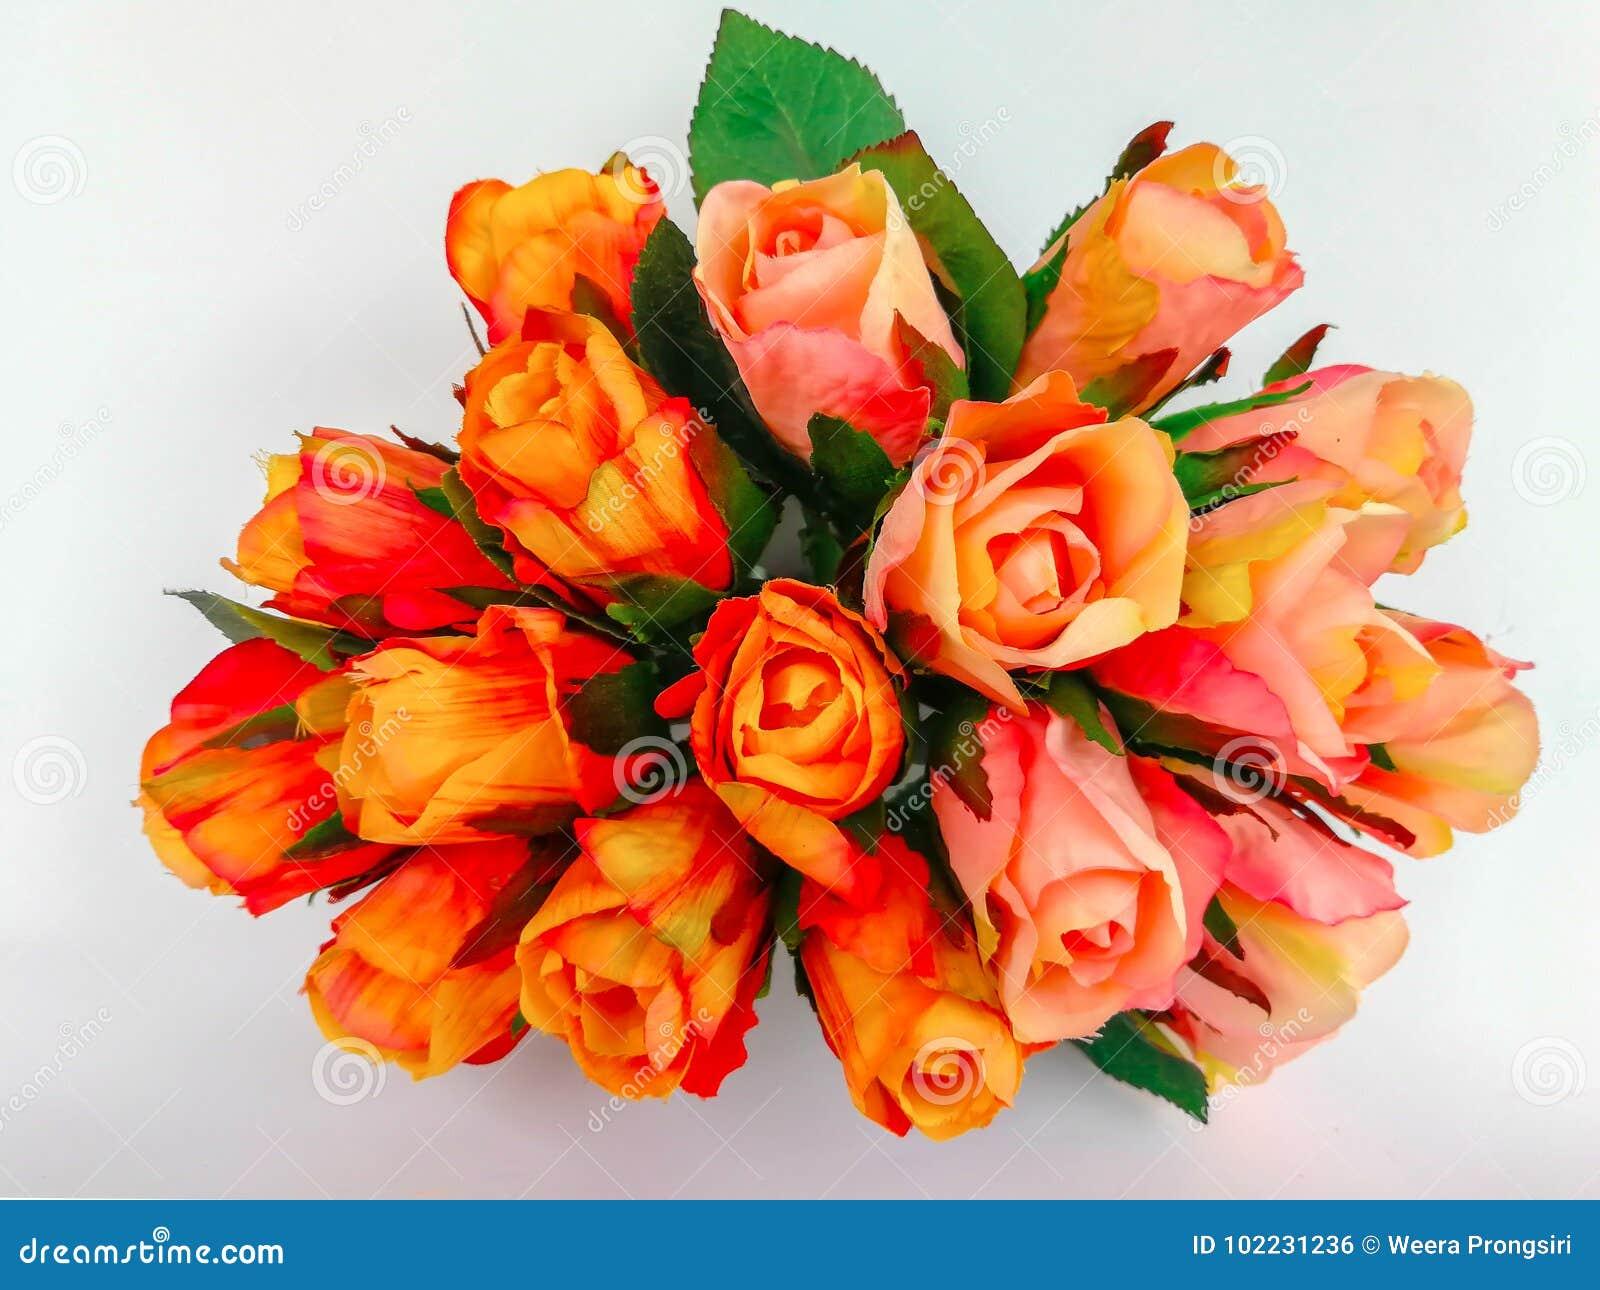 rose flower bunch of flowers bouquet flower vase stock photo